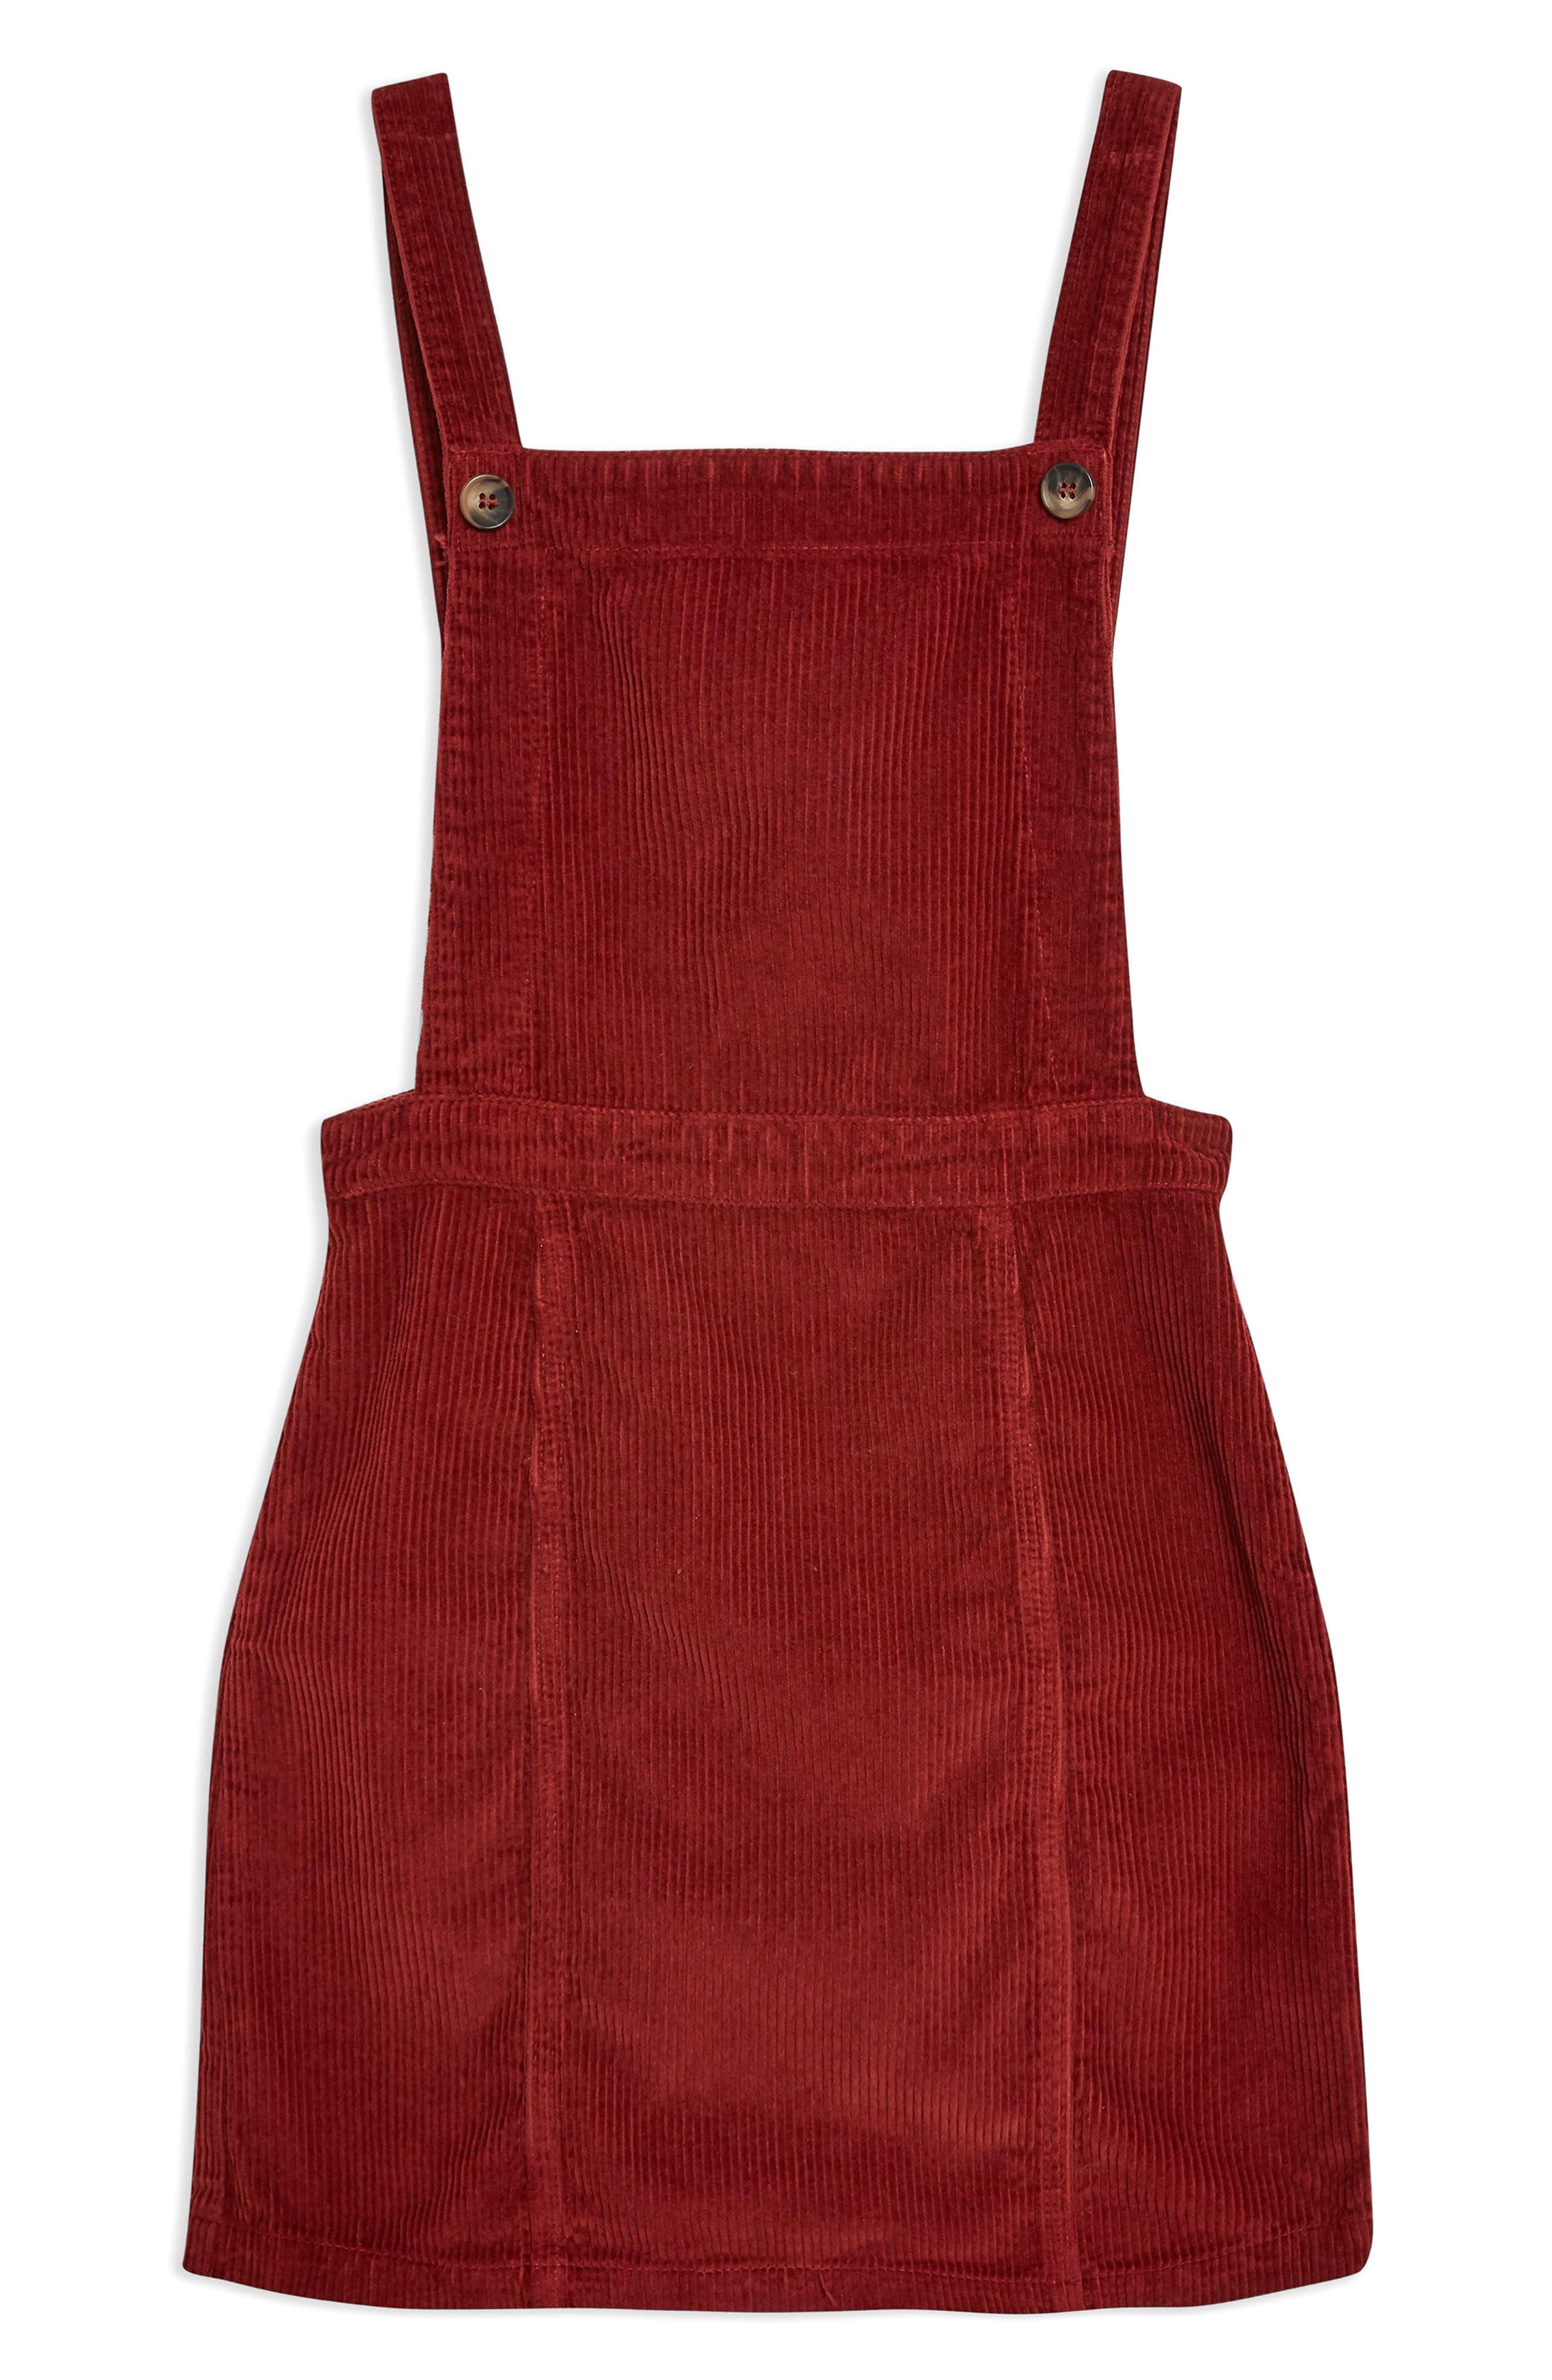 TOPSHOP,                             Horn Button Corduroy Pinafore Dress,                             Alternate thumbnail 4, color,                             RUST